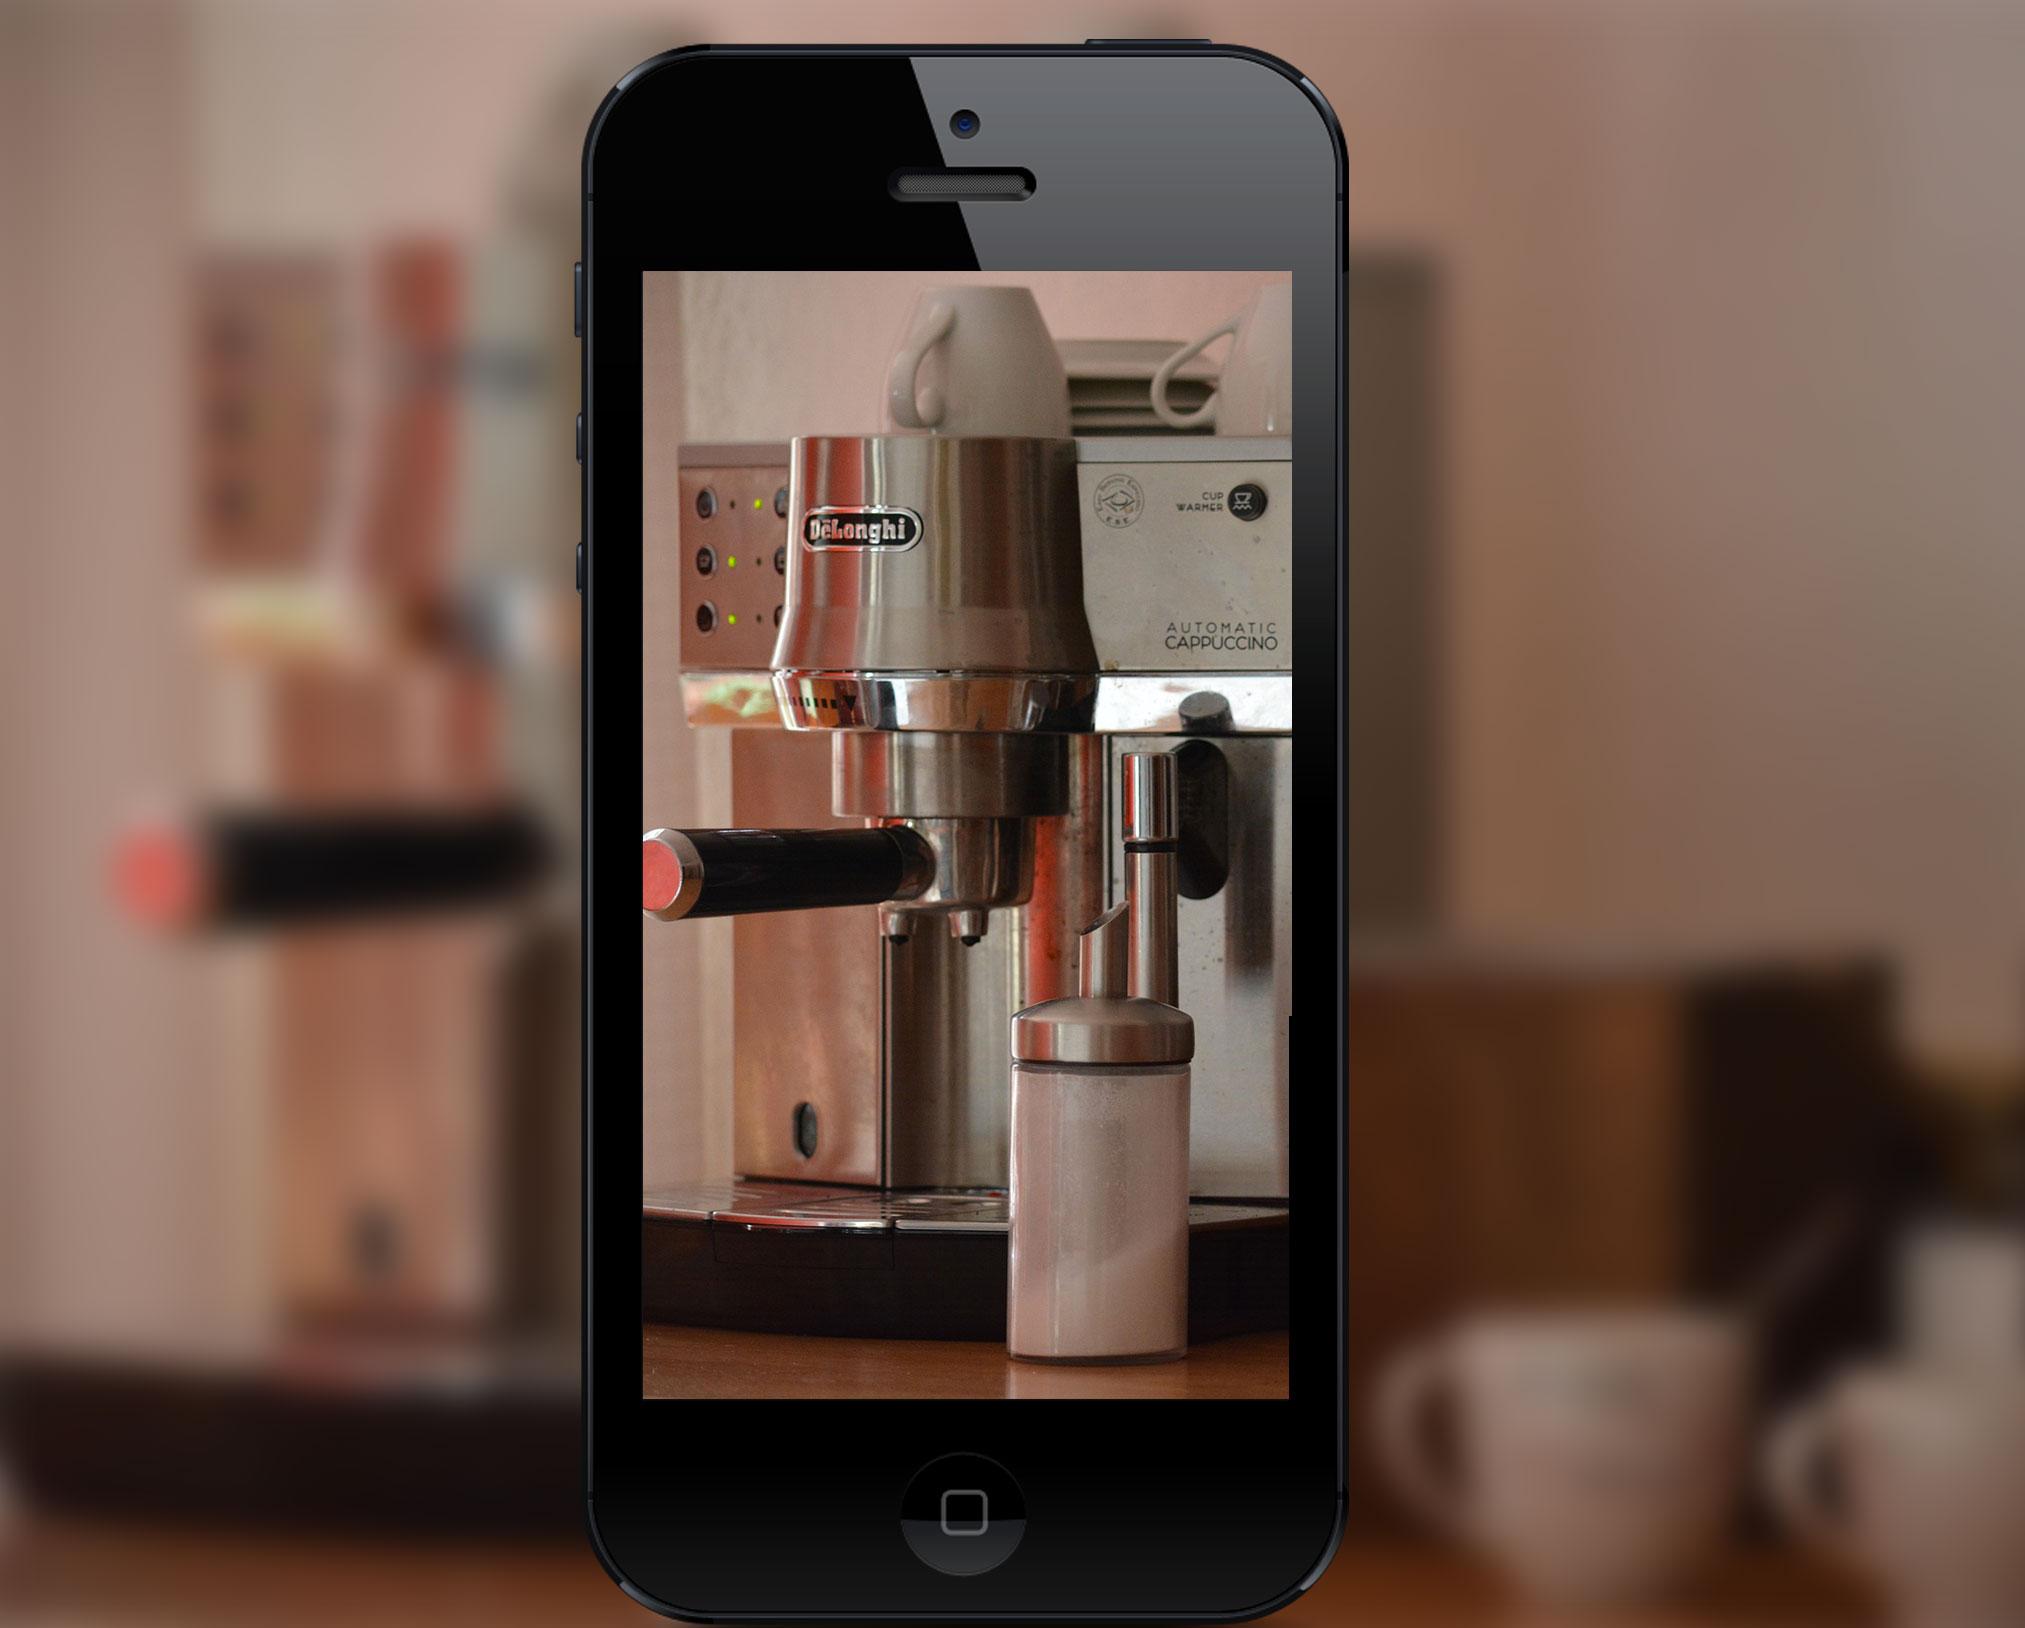 remote video live support by using camera on smartphone - service client à distance grâce à la caméra du smartphone